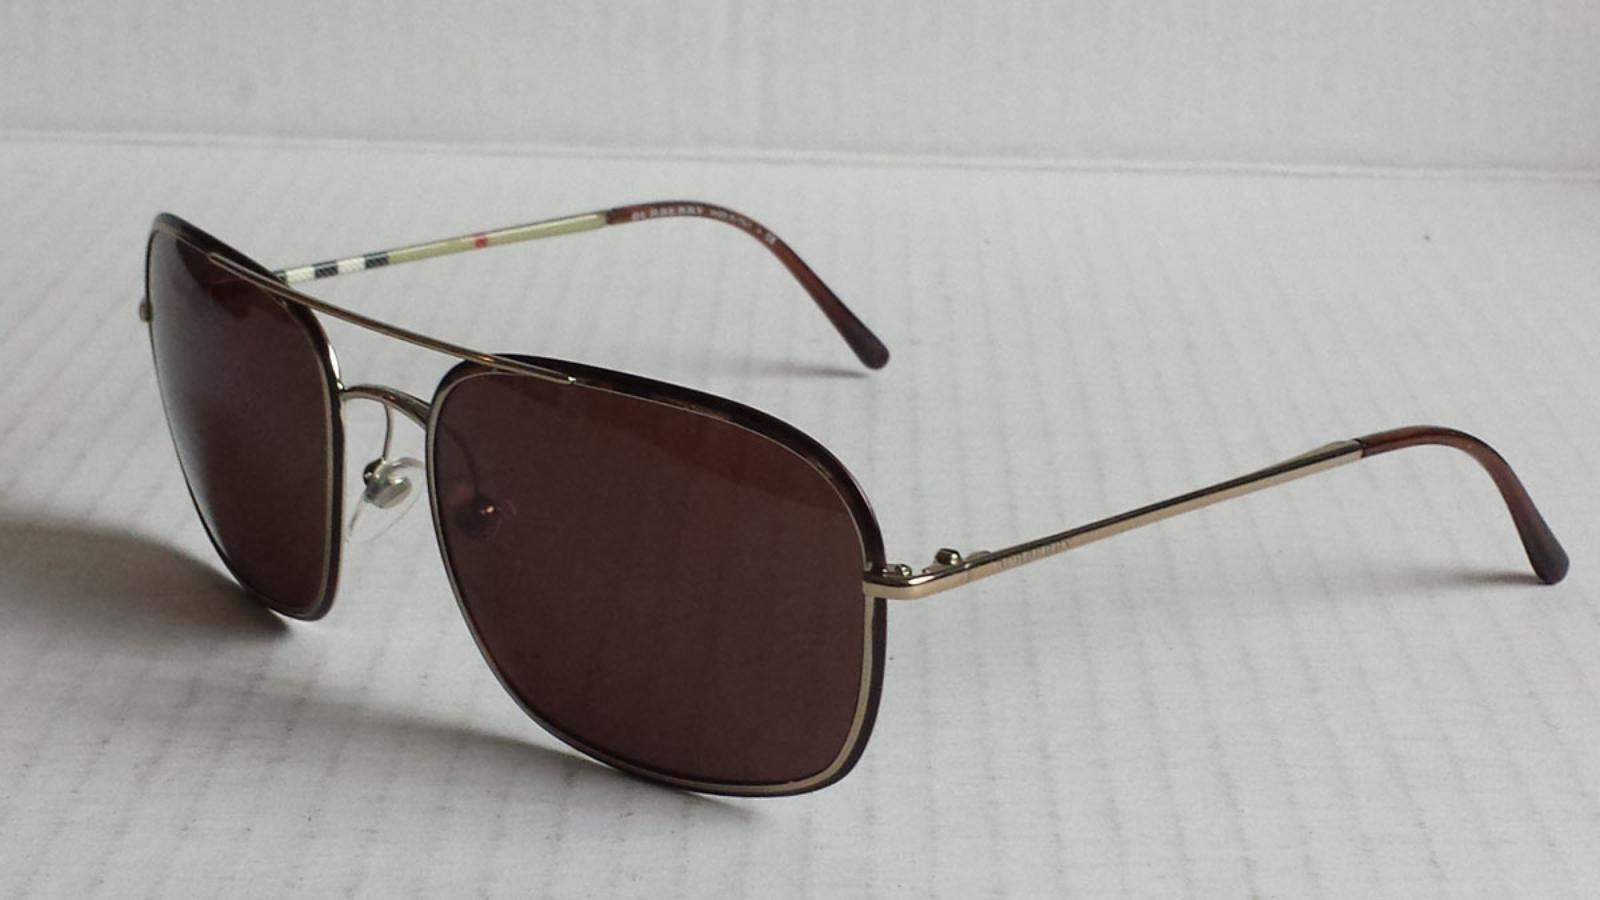 da919dc33a44  Burberry men sunglasses B3061 rectangular aviator Made in Italy Brown lens  visit our ebay store